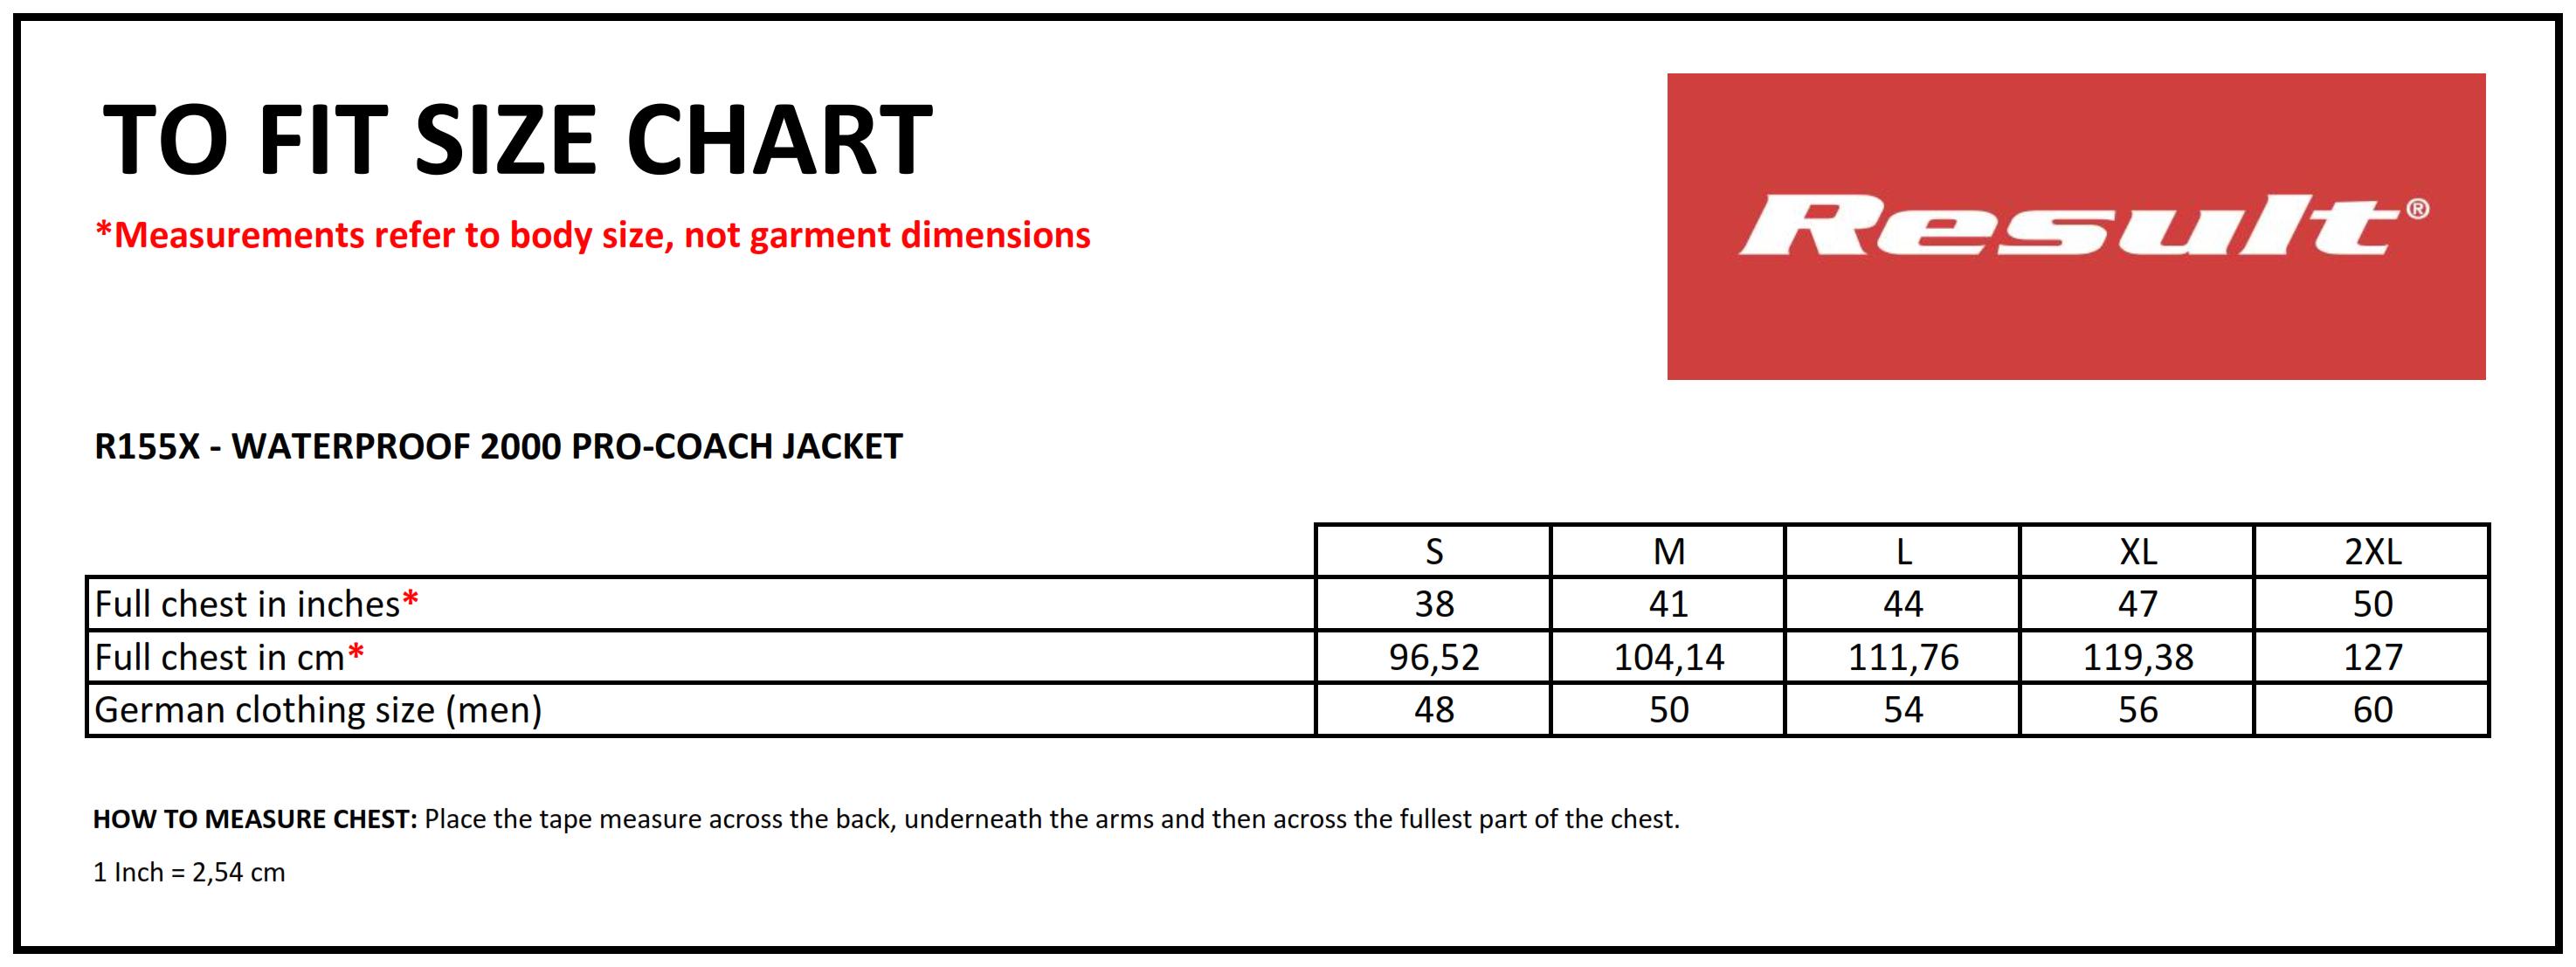 Result: Waterproof 2000 Pro-Coach Jacket R155X